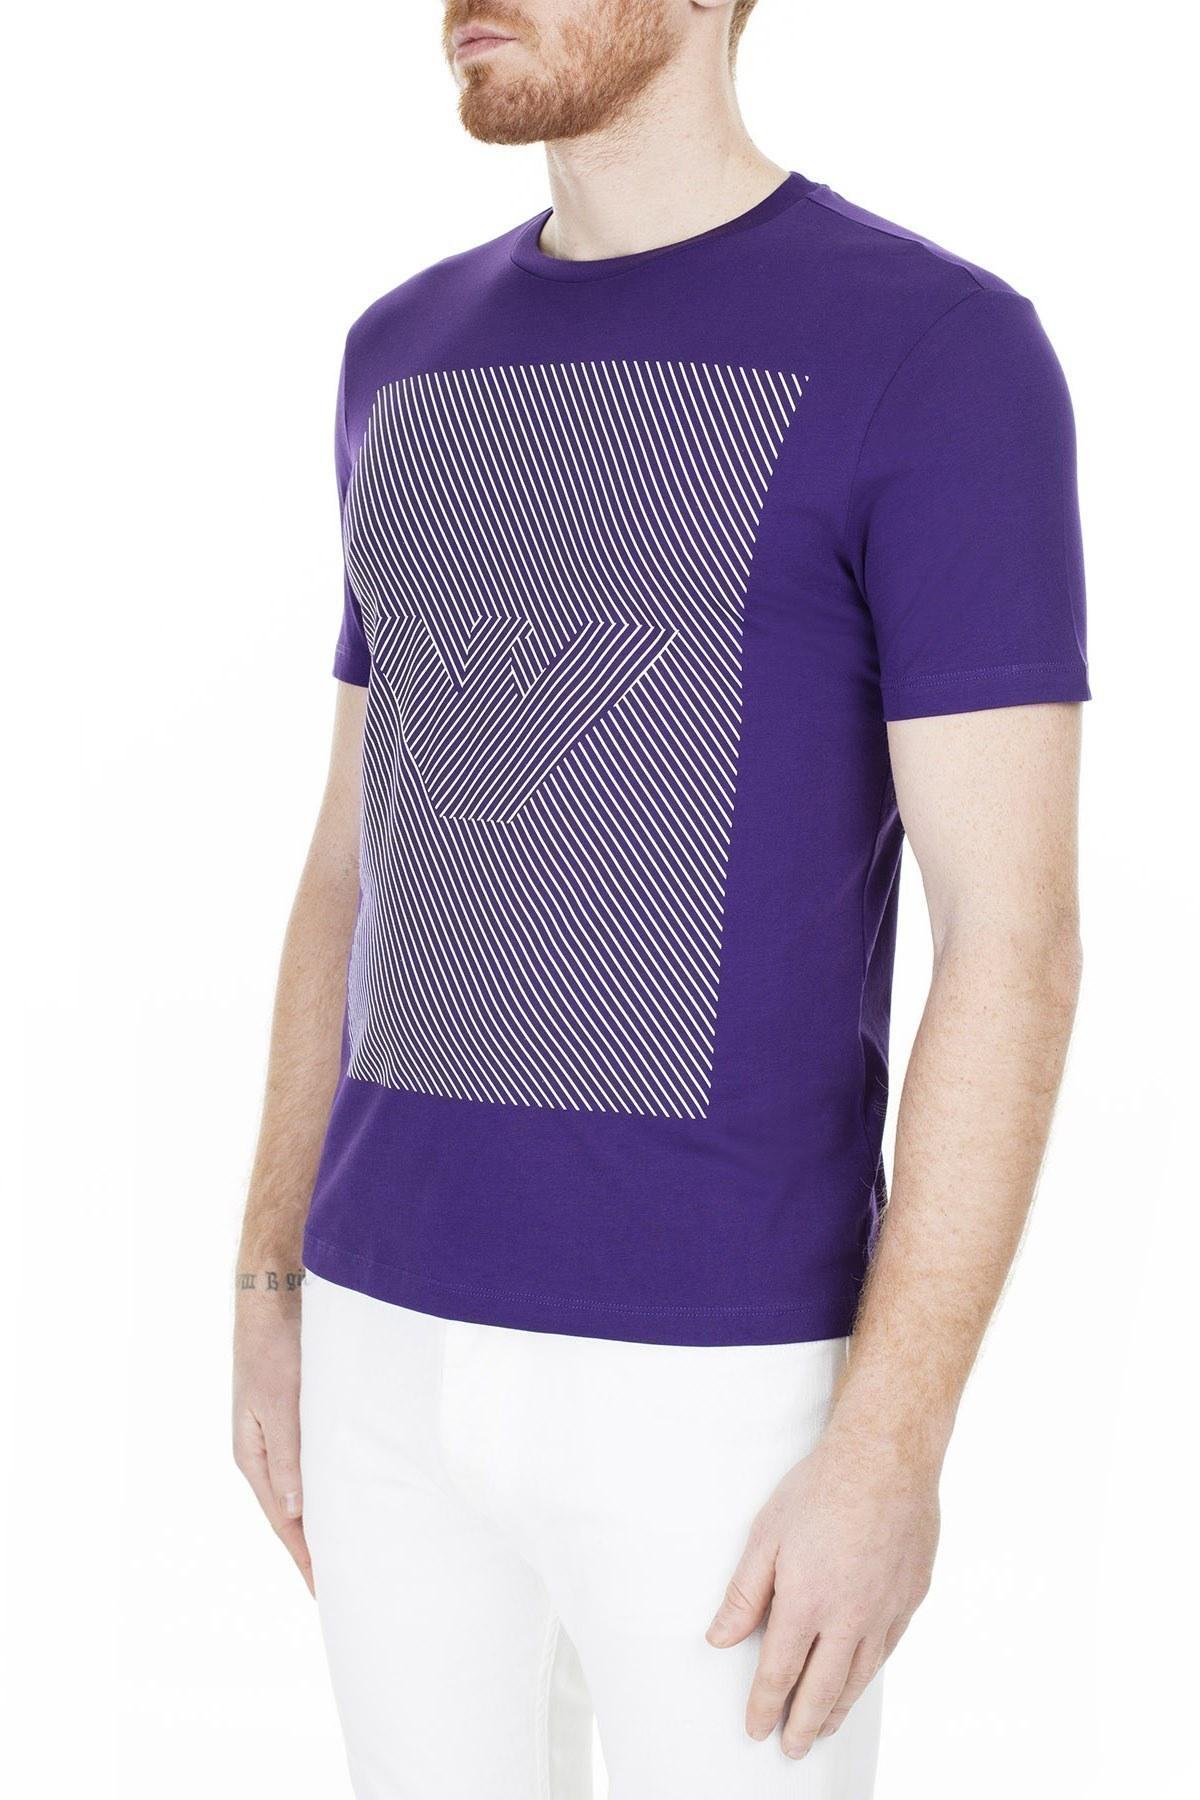 Emporio Armani Erkek T Shirt 3H1TB2 1JNQZ 0832 MOR